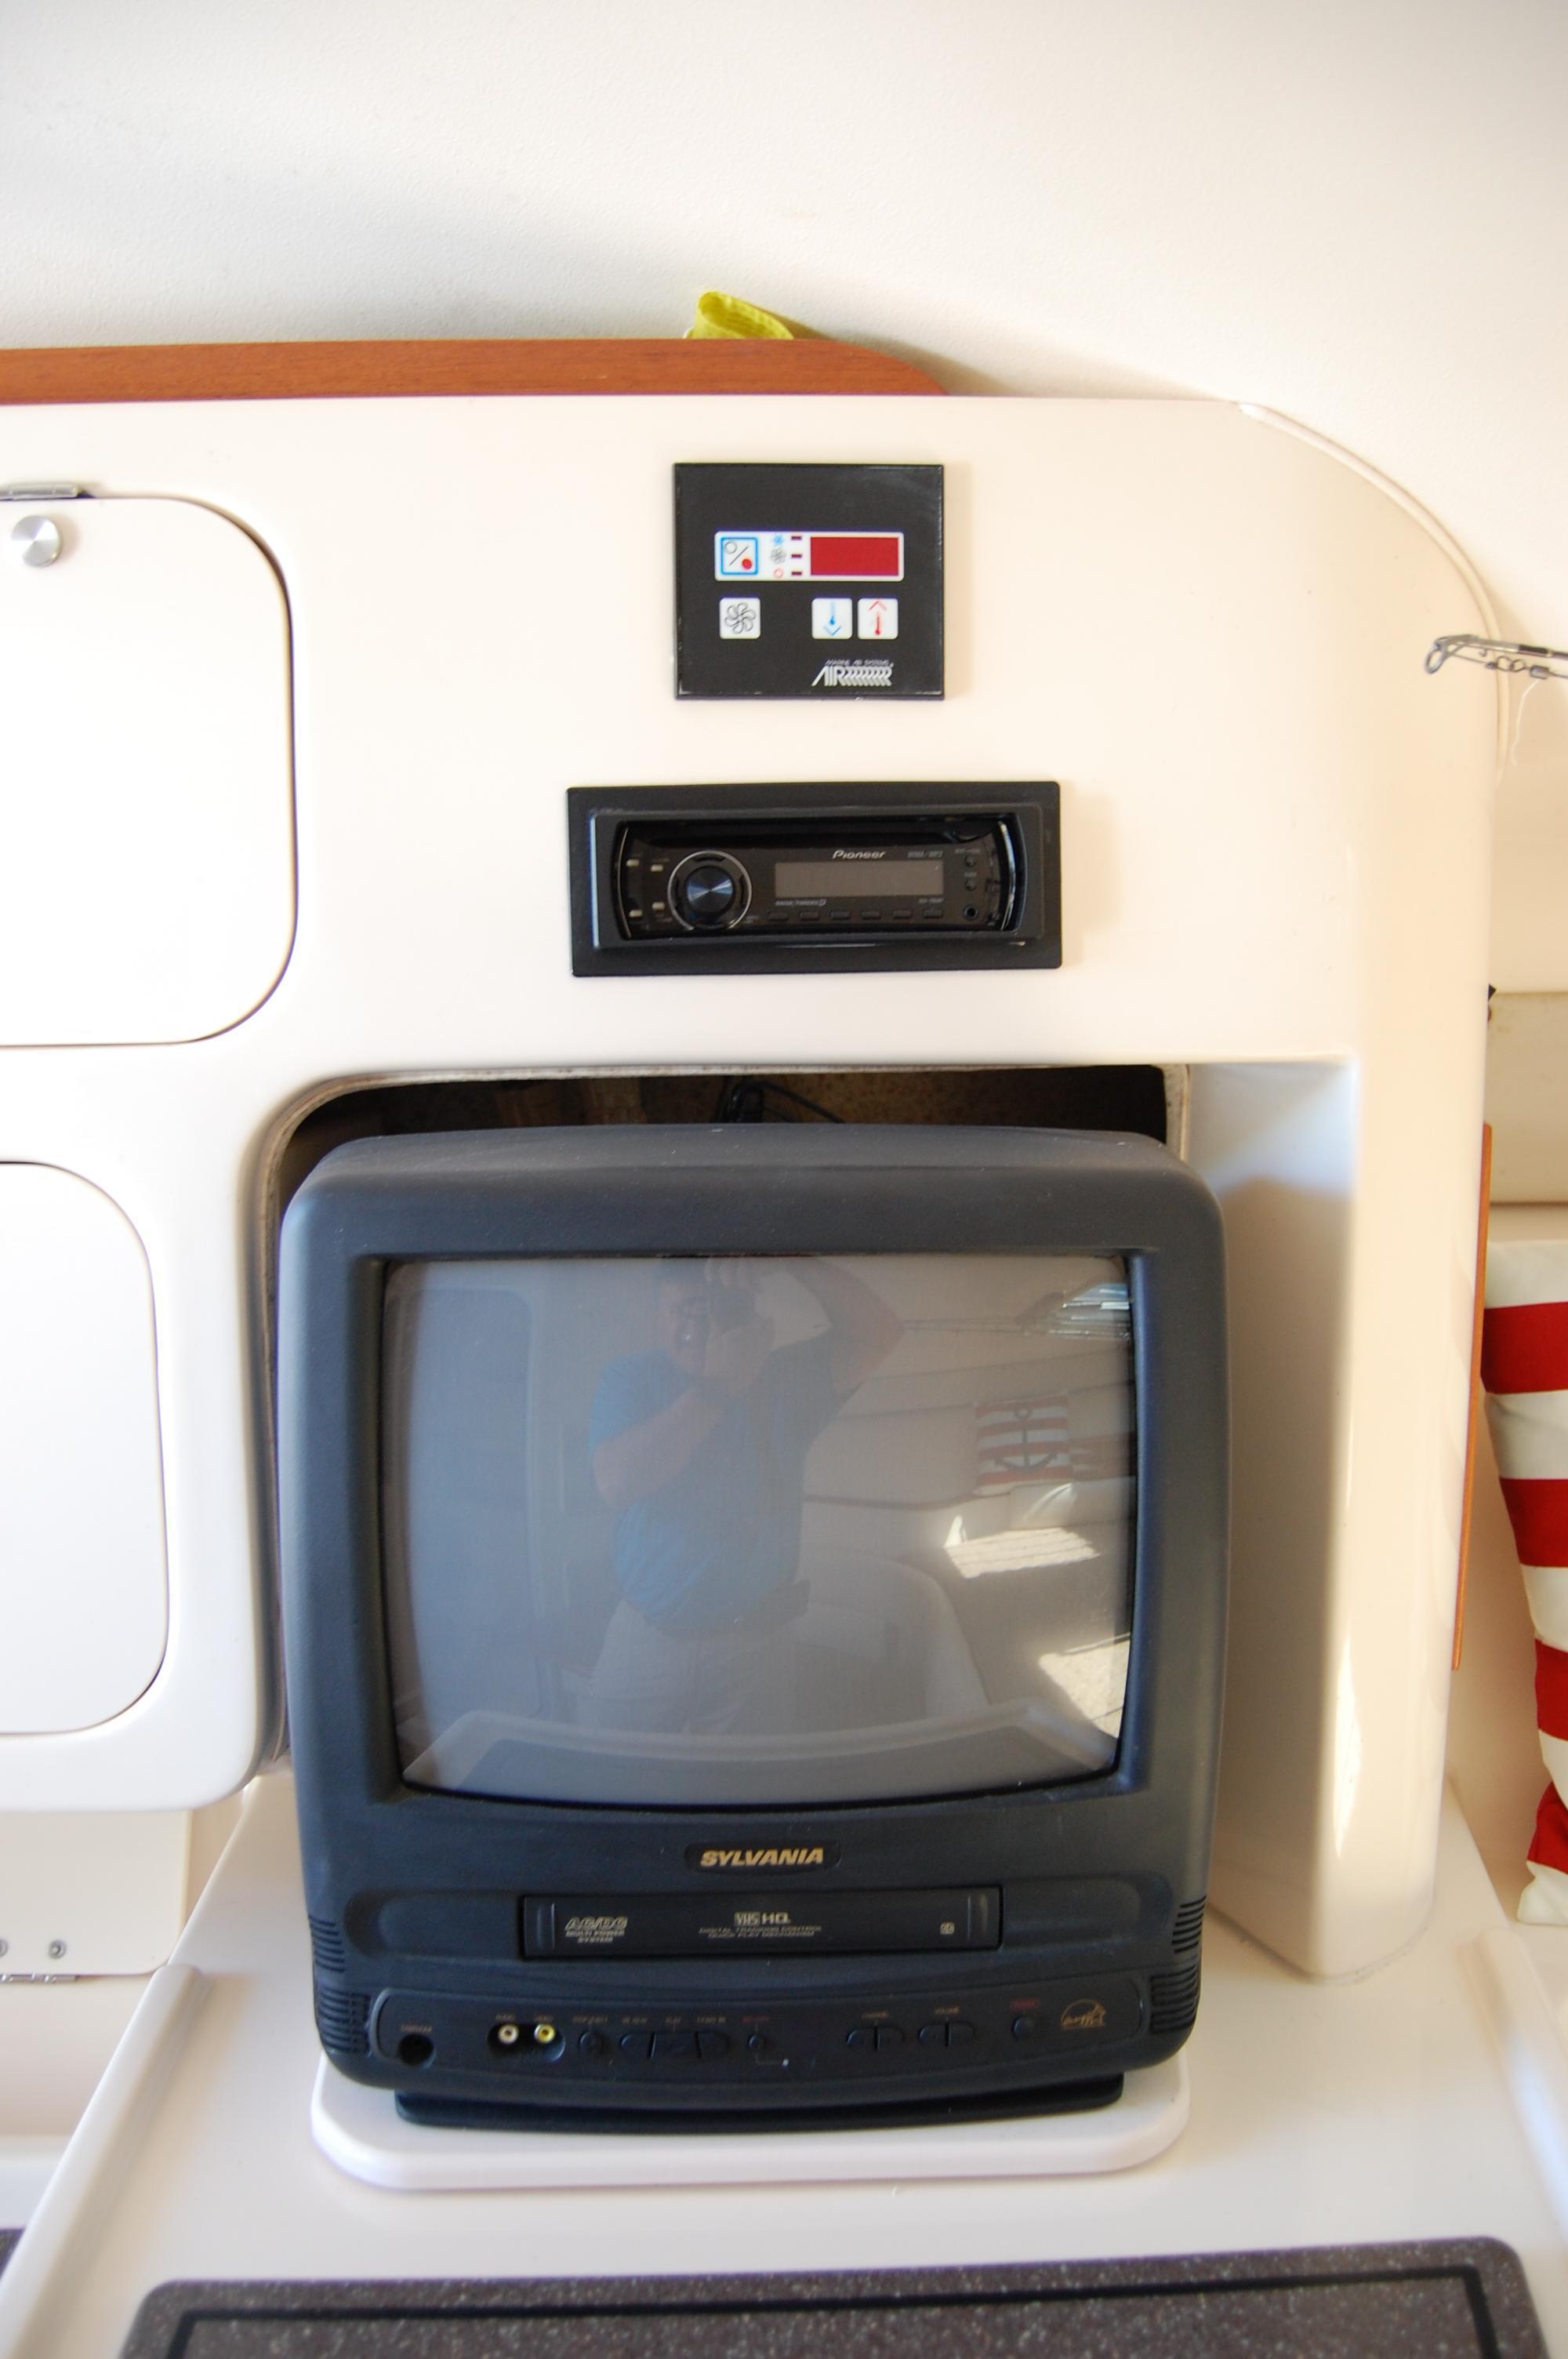 2002 Grady White 330 Express, HVAC Control panel, Pioneer stereo, Sylvania TV/VCR player